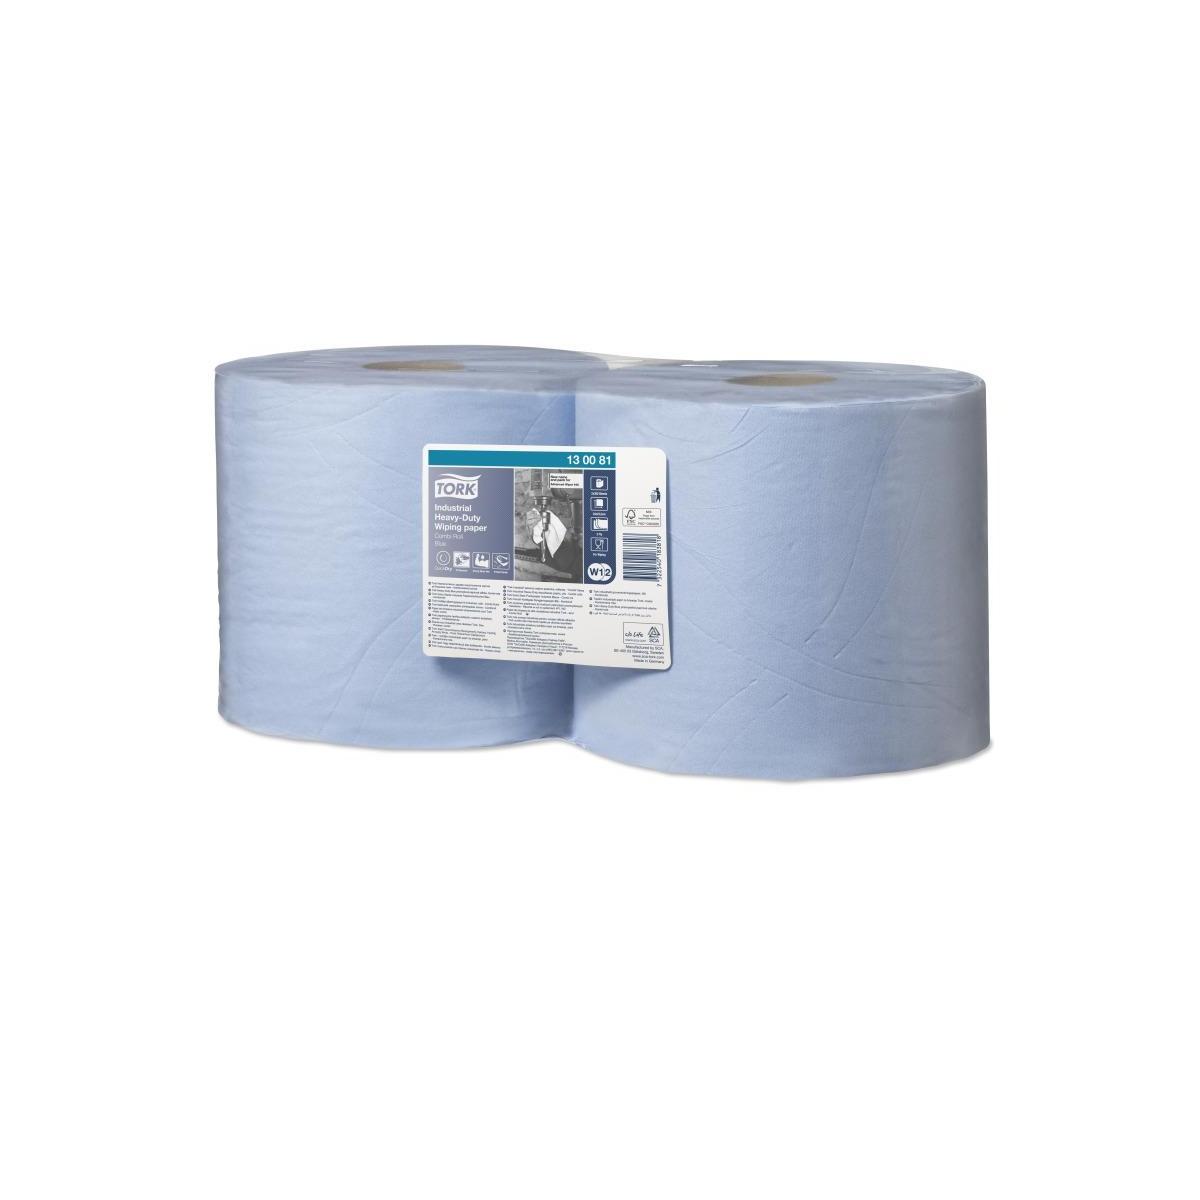 TORK ADV WIPER 440 BLUE-234